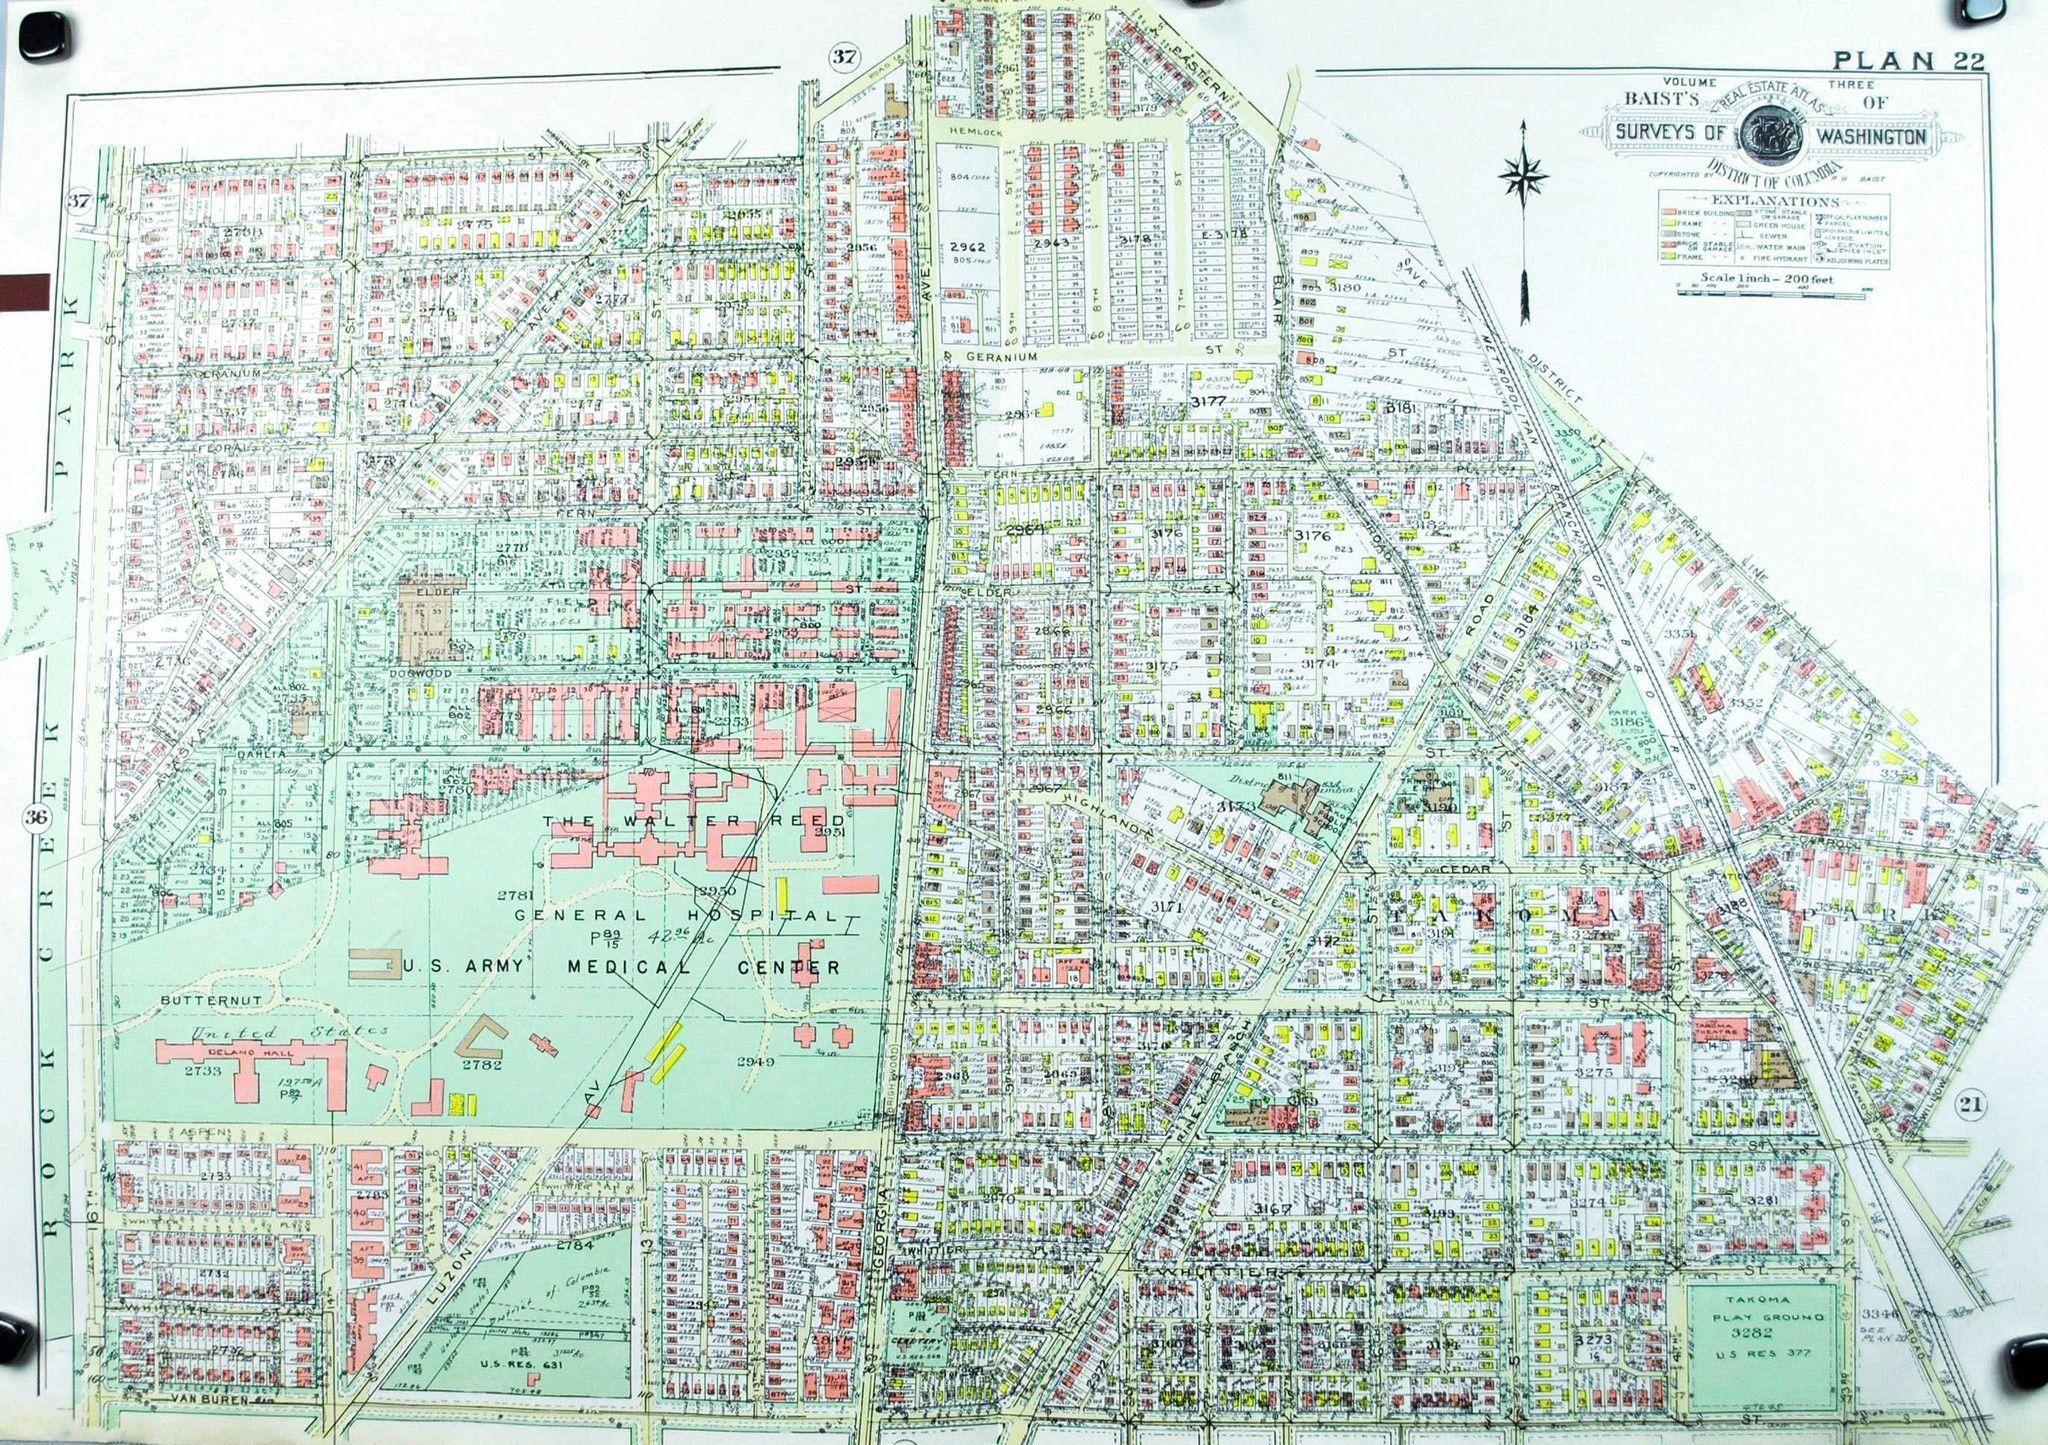 1960 Washington DC Plan 22 Baist